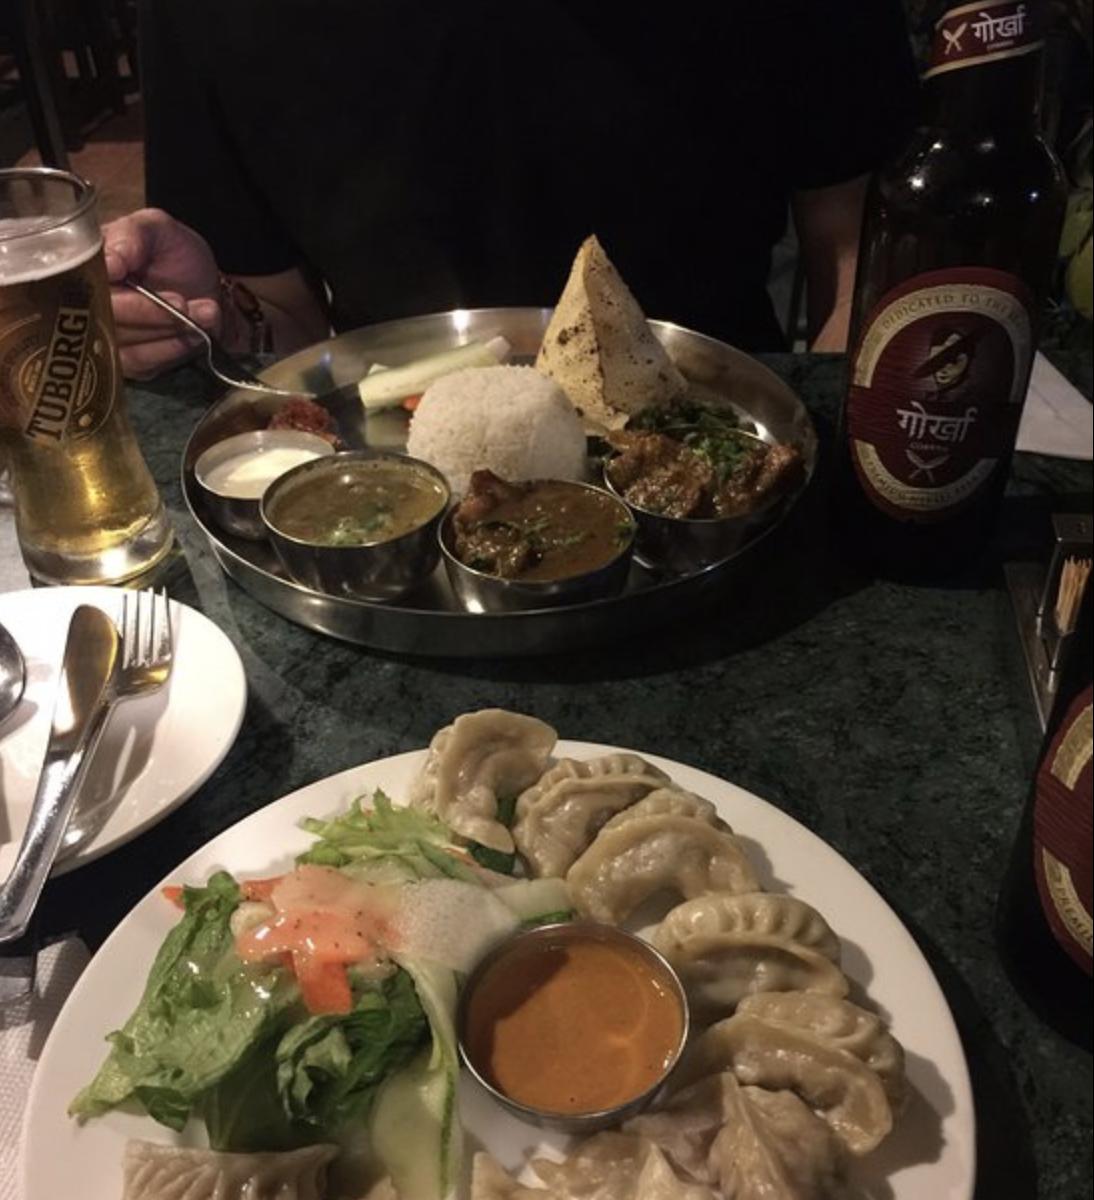 Delicious food at Frens in Kathmandu, Nepal